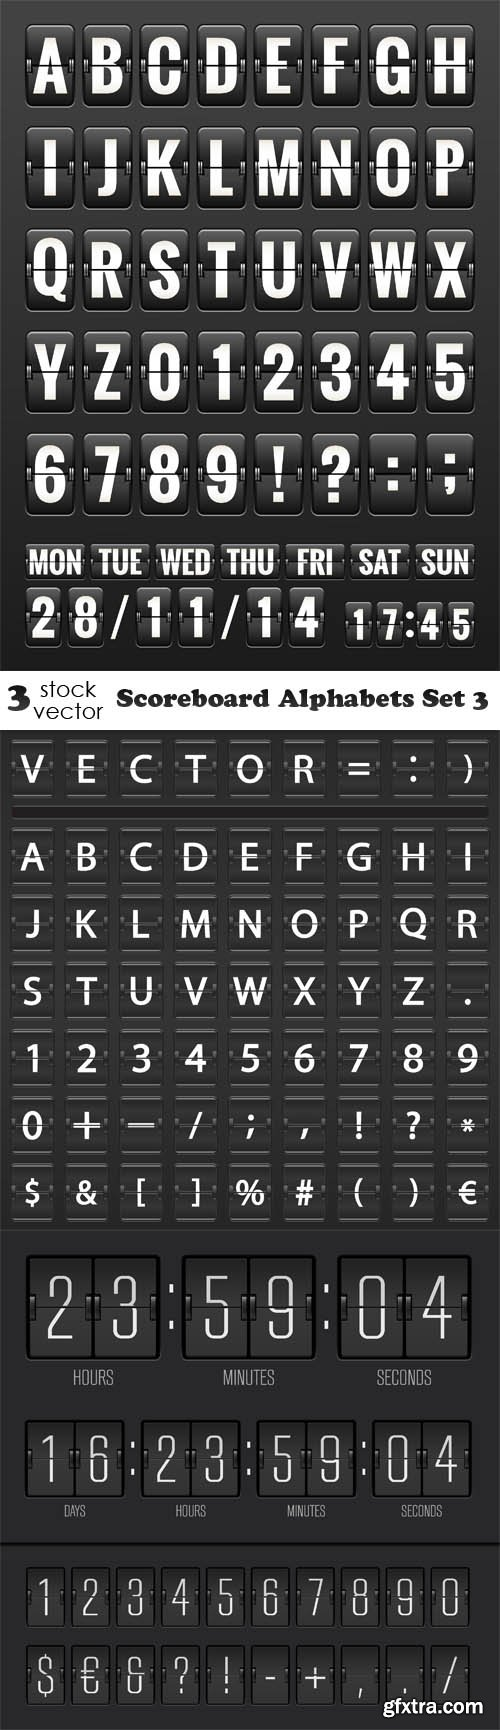 Vectors - Scoreboard Alphabets Set 3